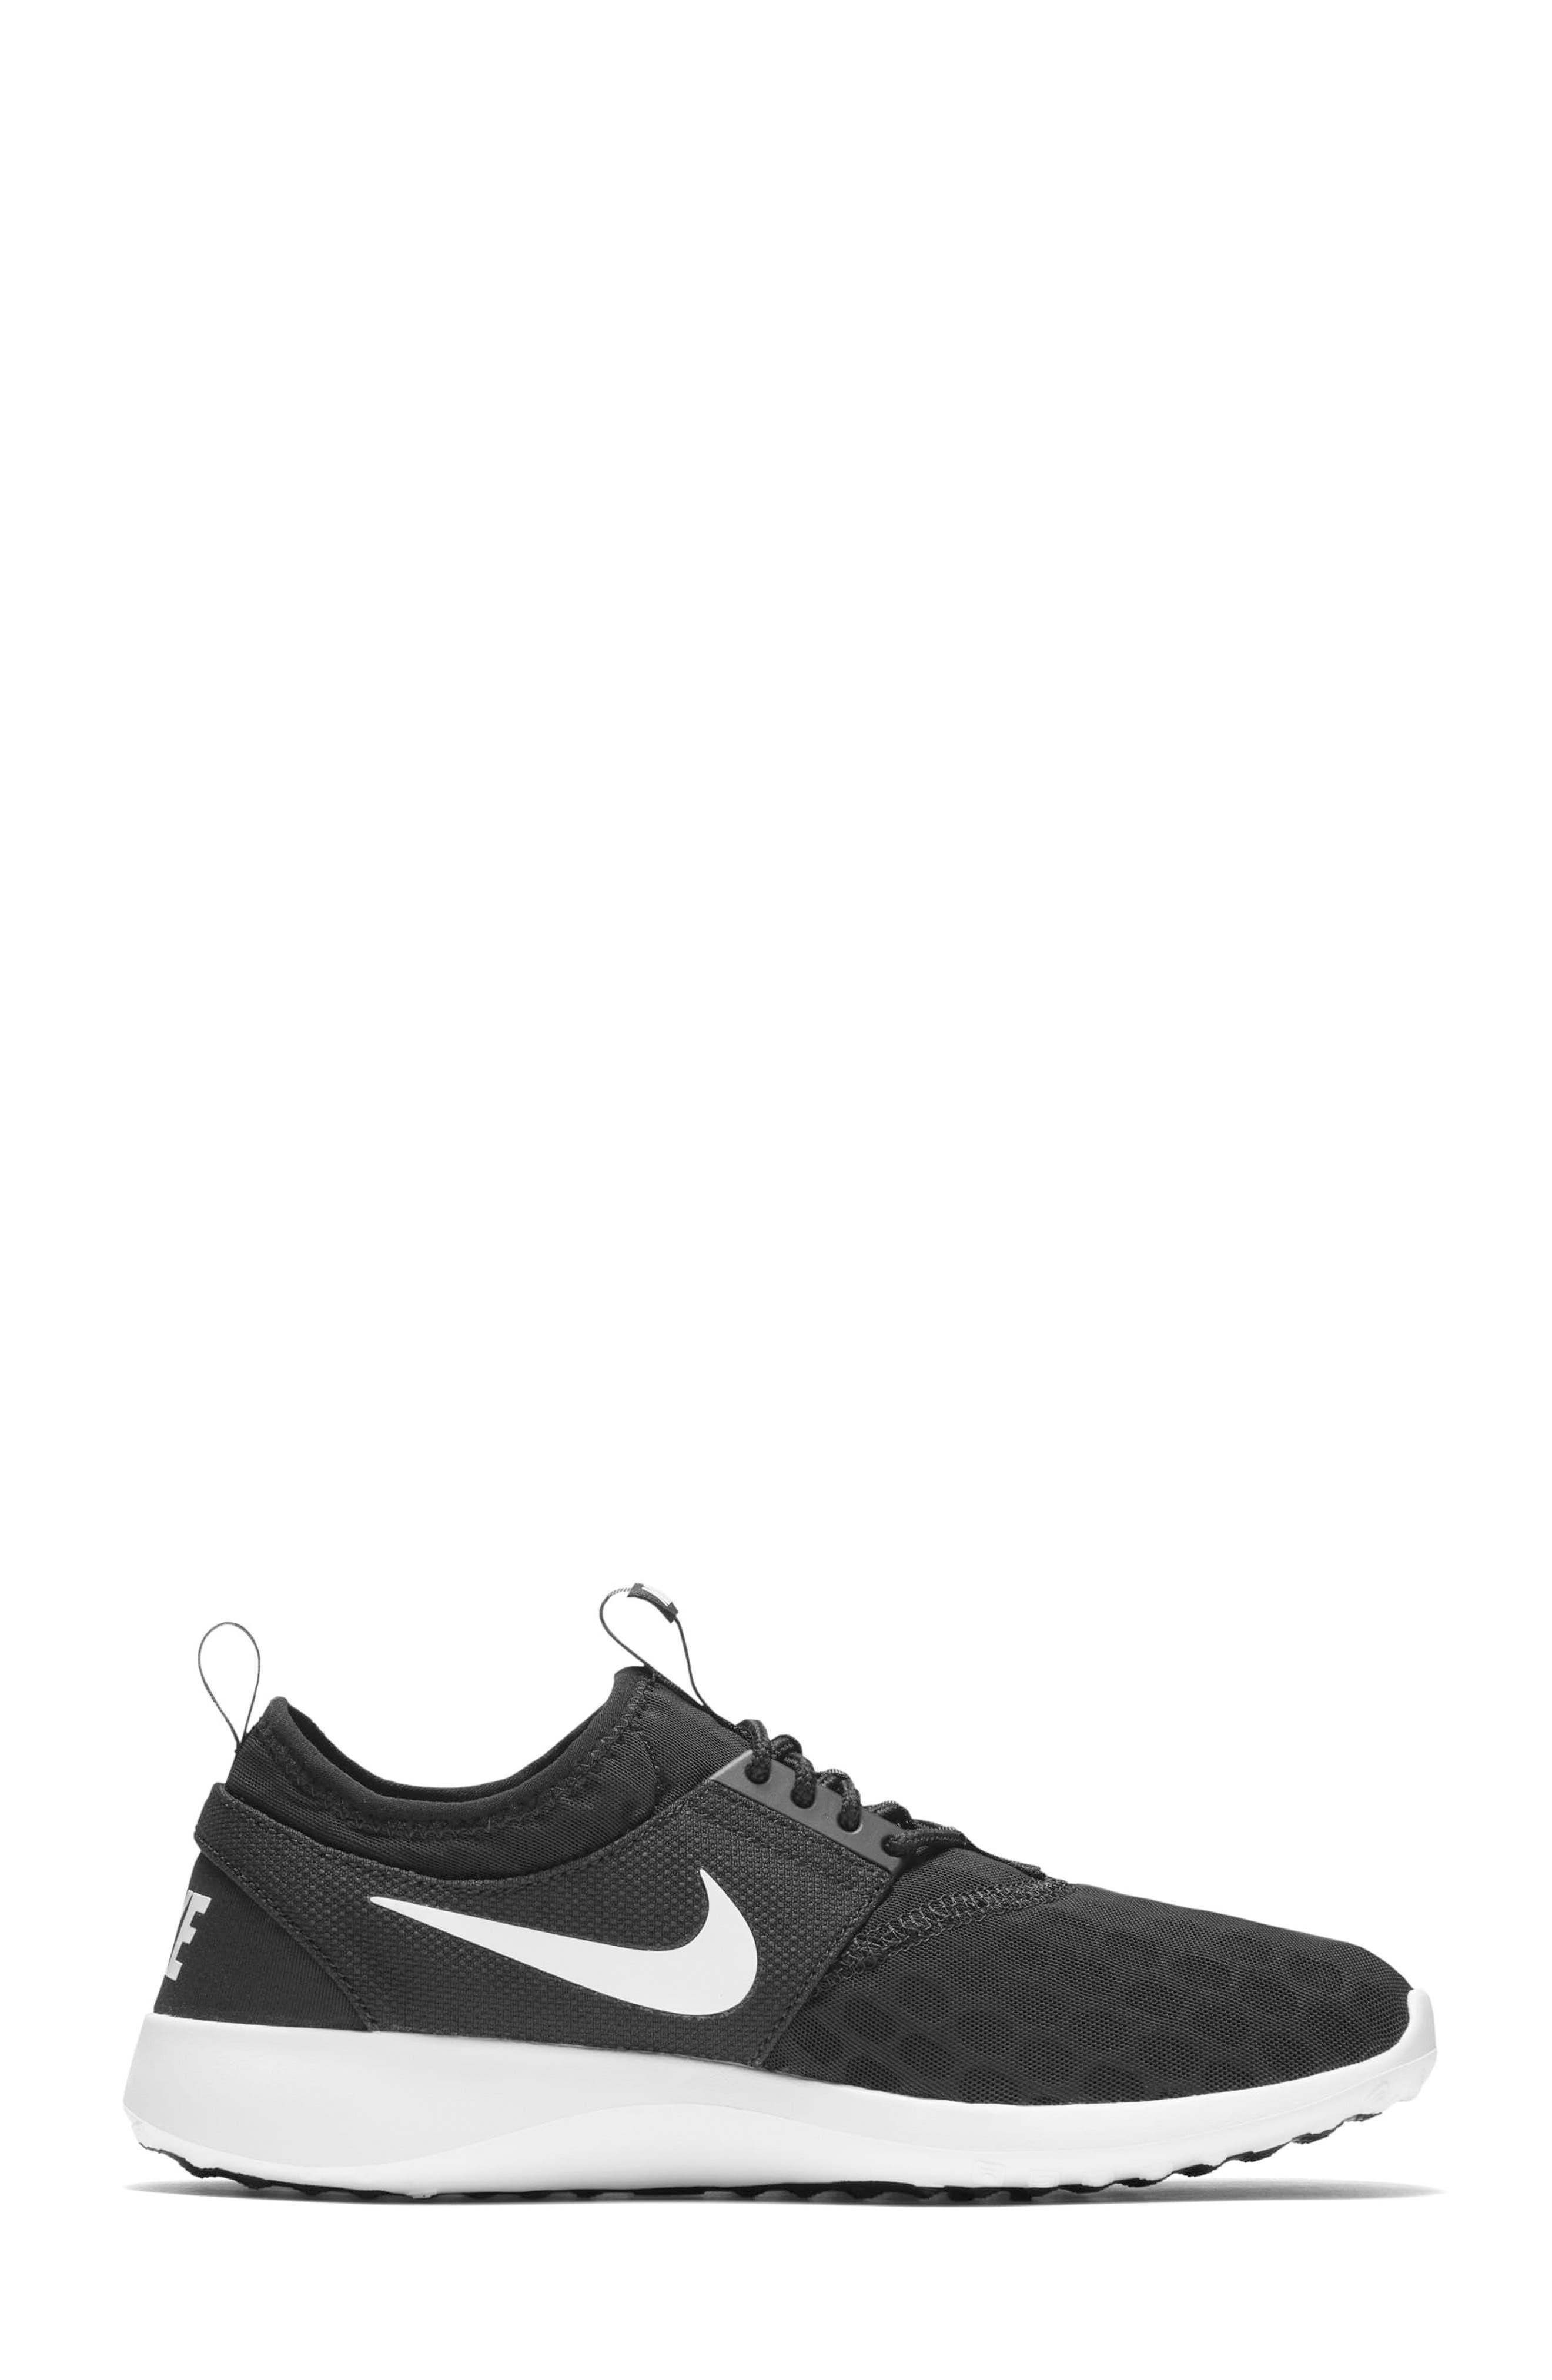 Juvenate Sneaker,                             Alternate thumbnail 164, color,